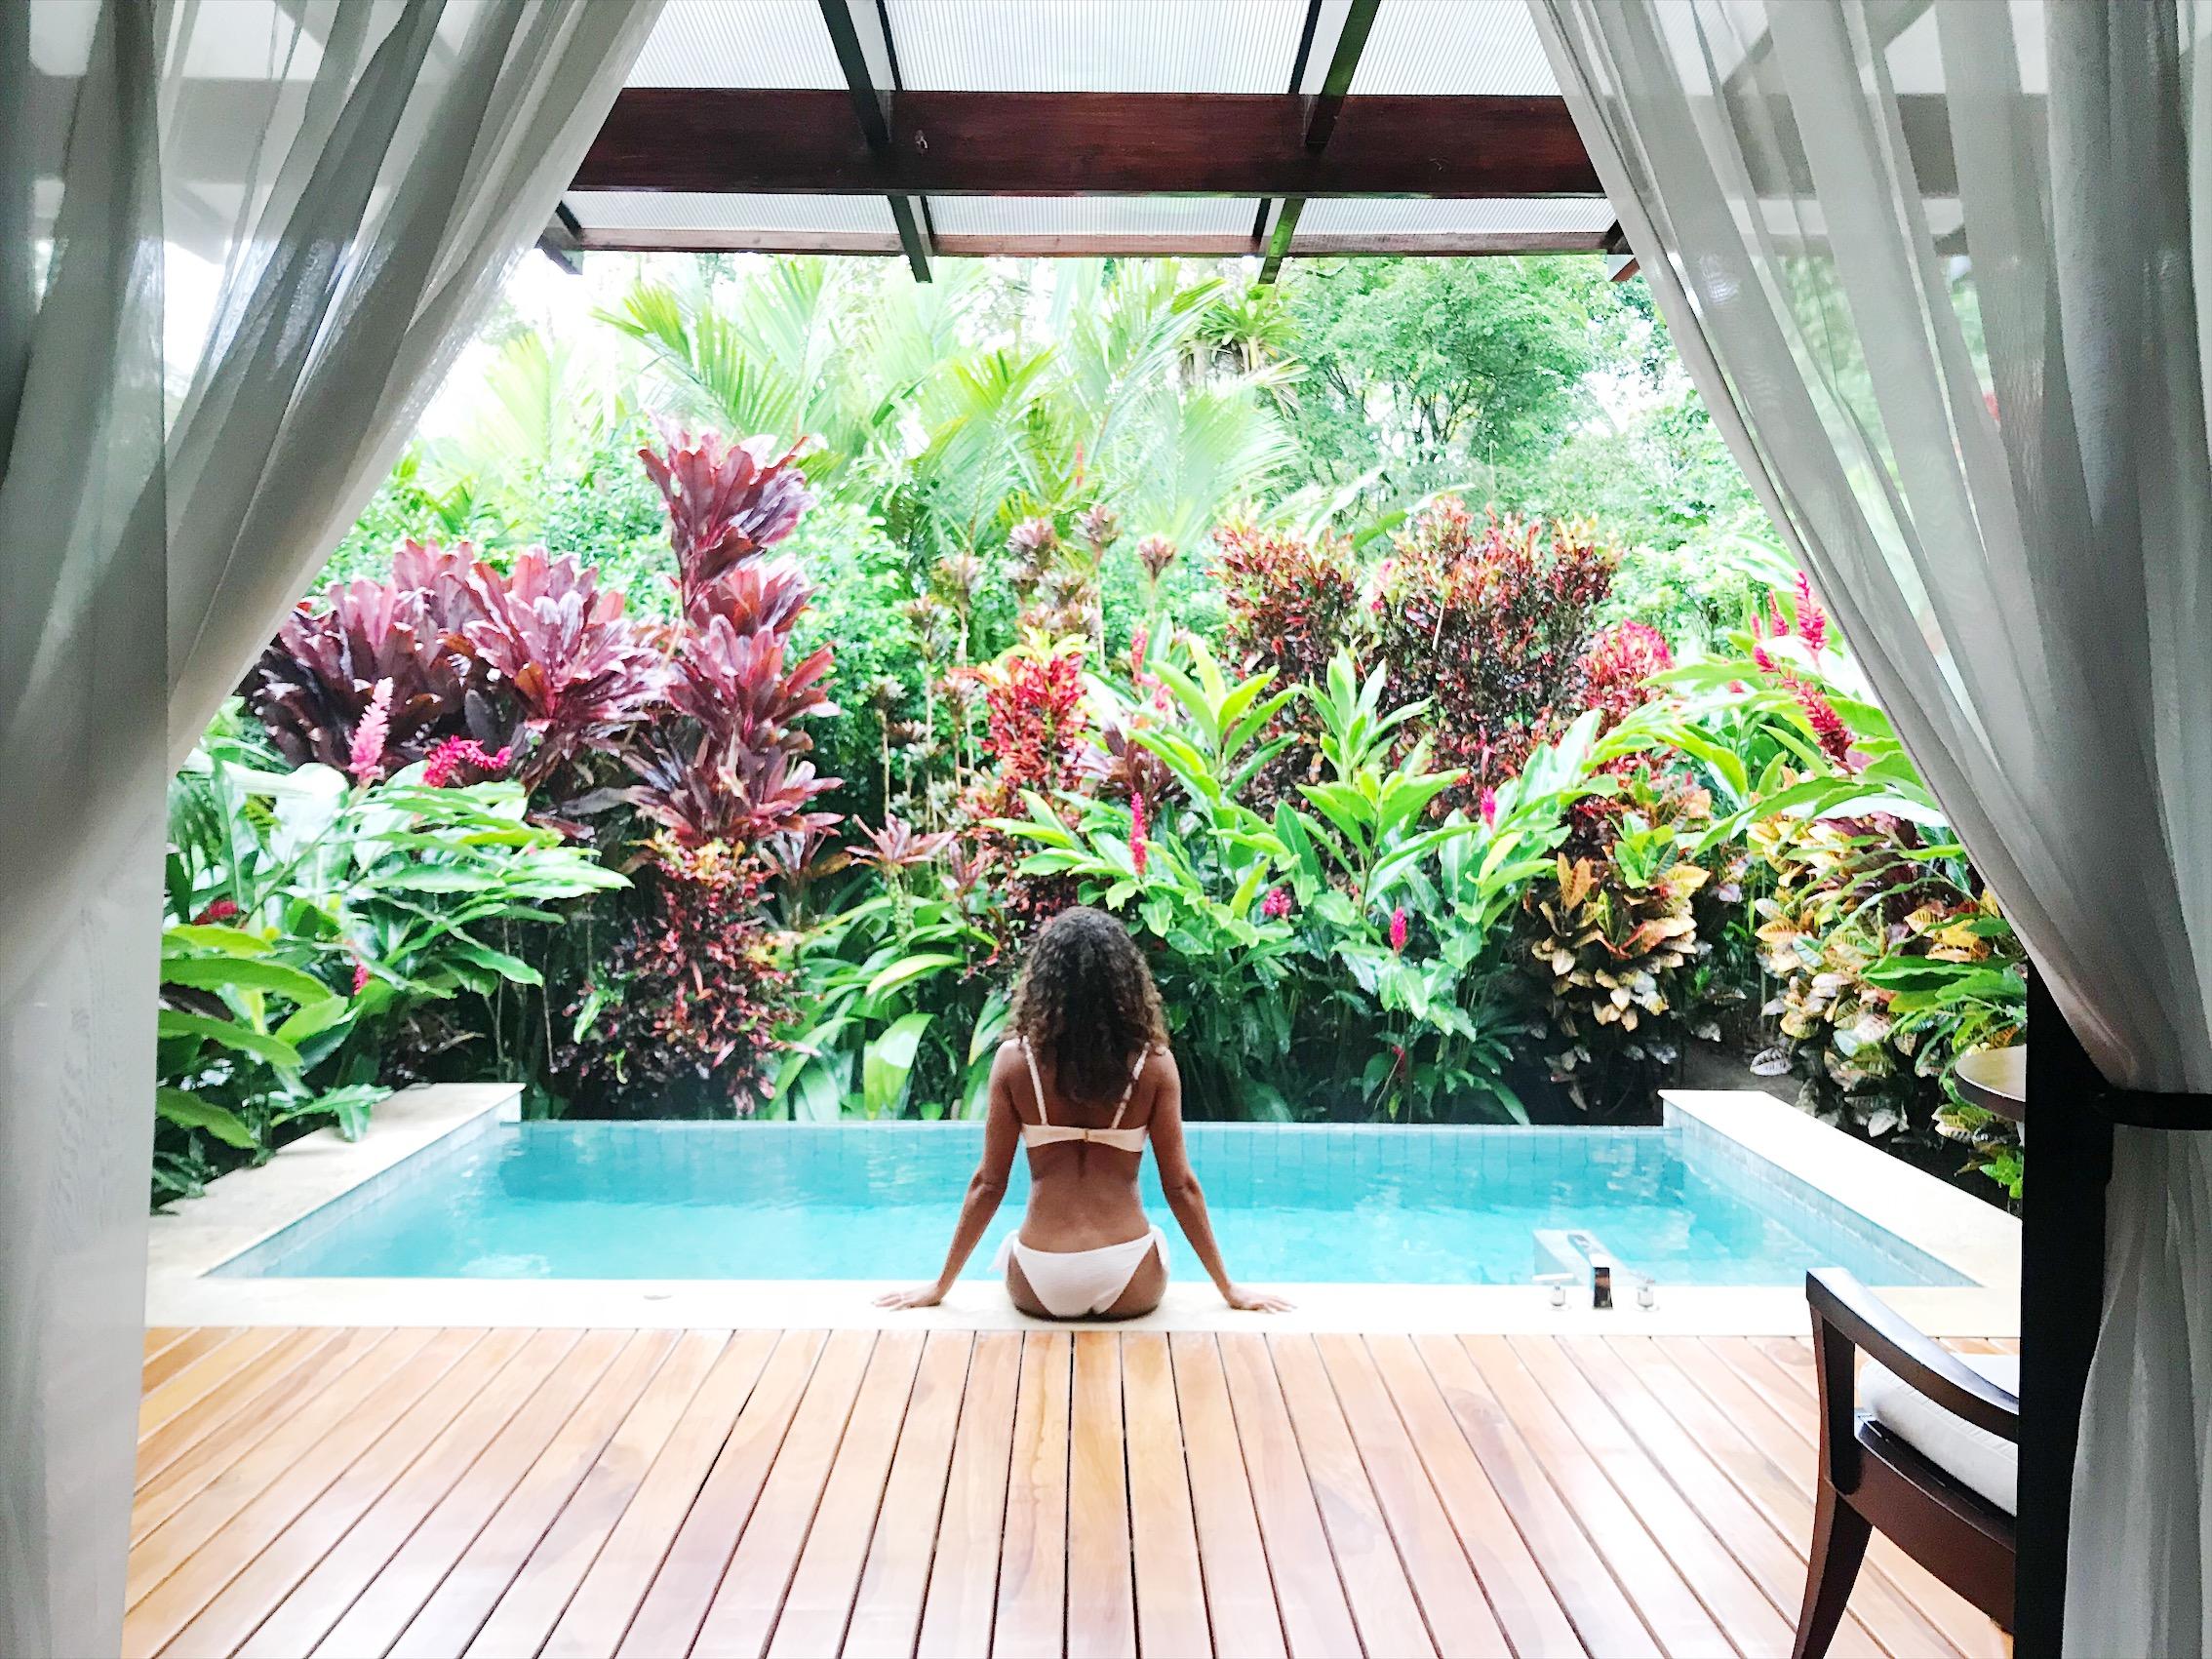 The perfect honeymoon in Costa Rica